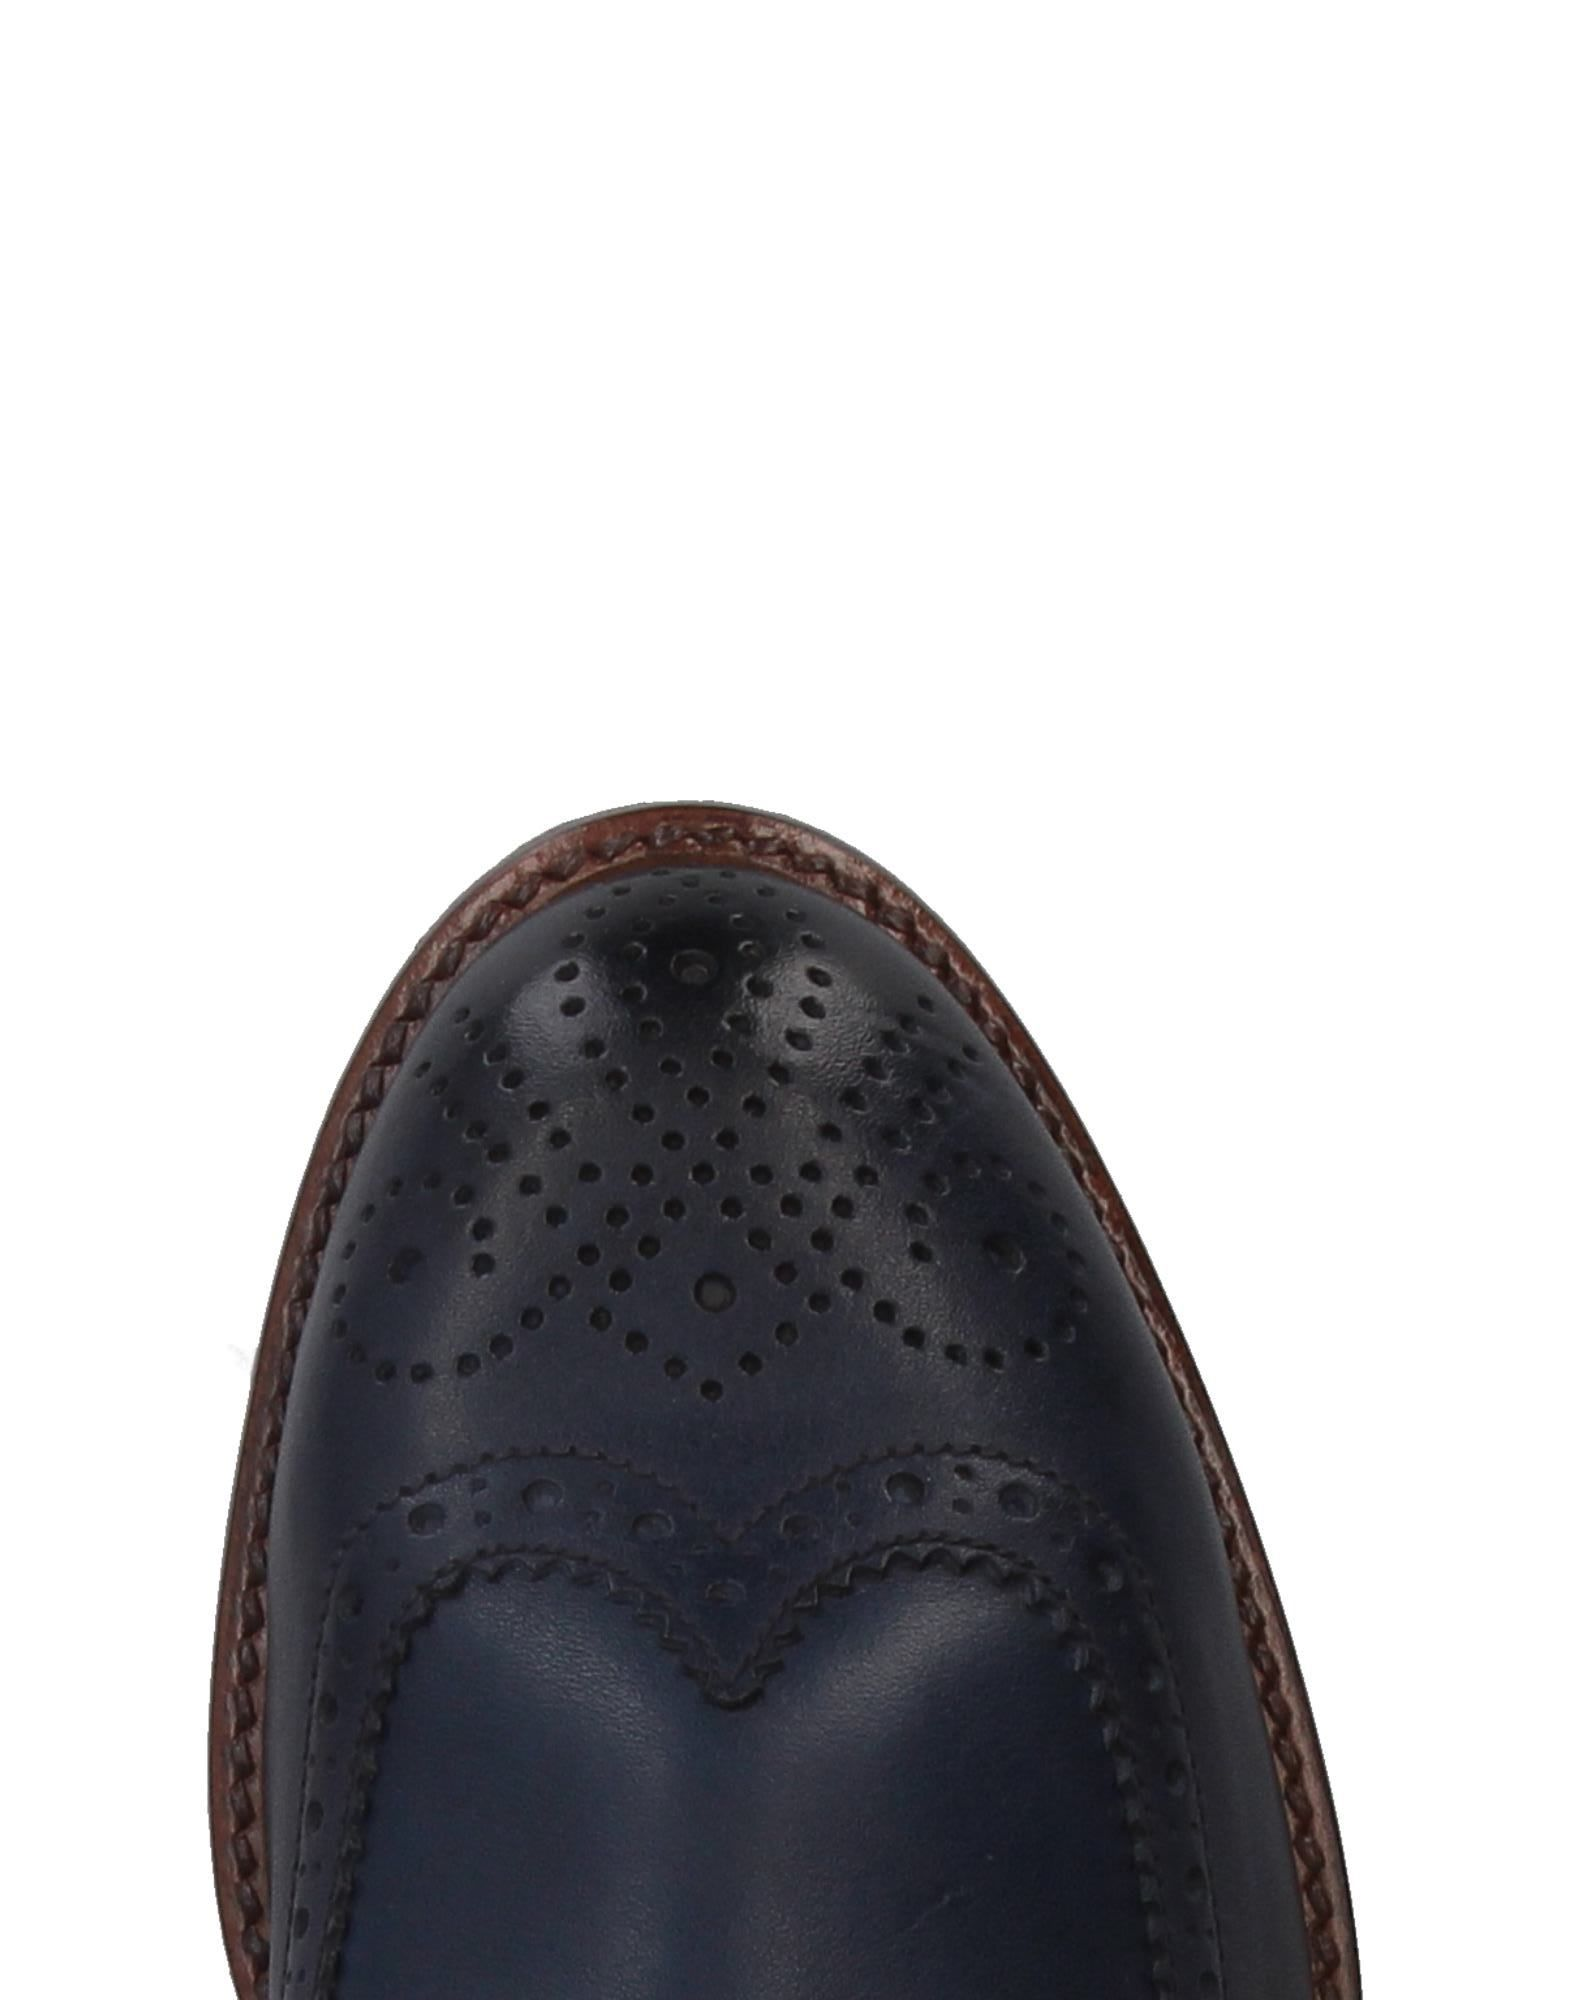 Doucal's Schnürschuhe Schuhe Herren  11407371FJ Heiße Schuhe Schnürschuhe f7cb2f